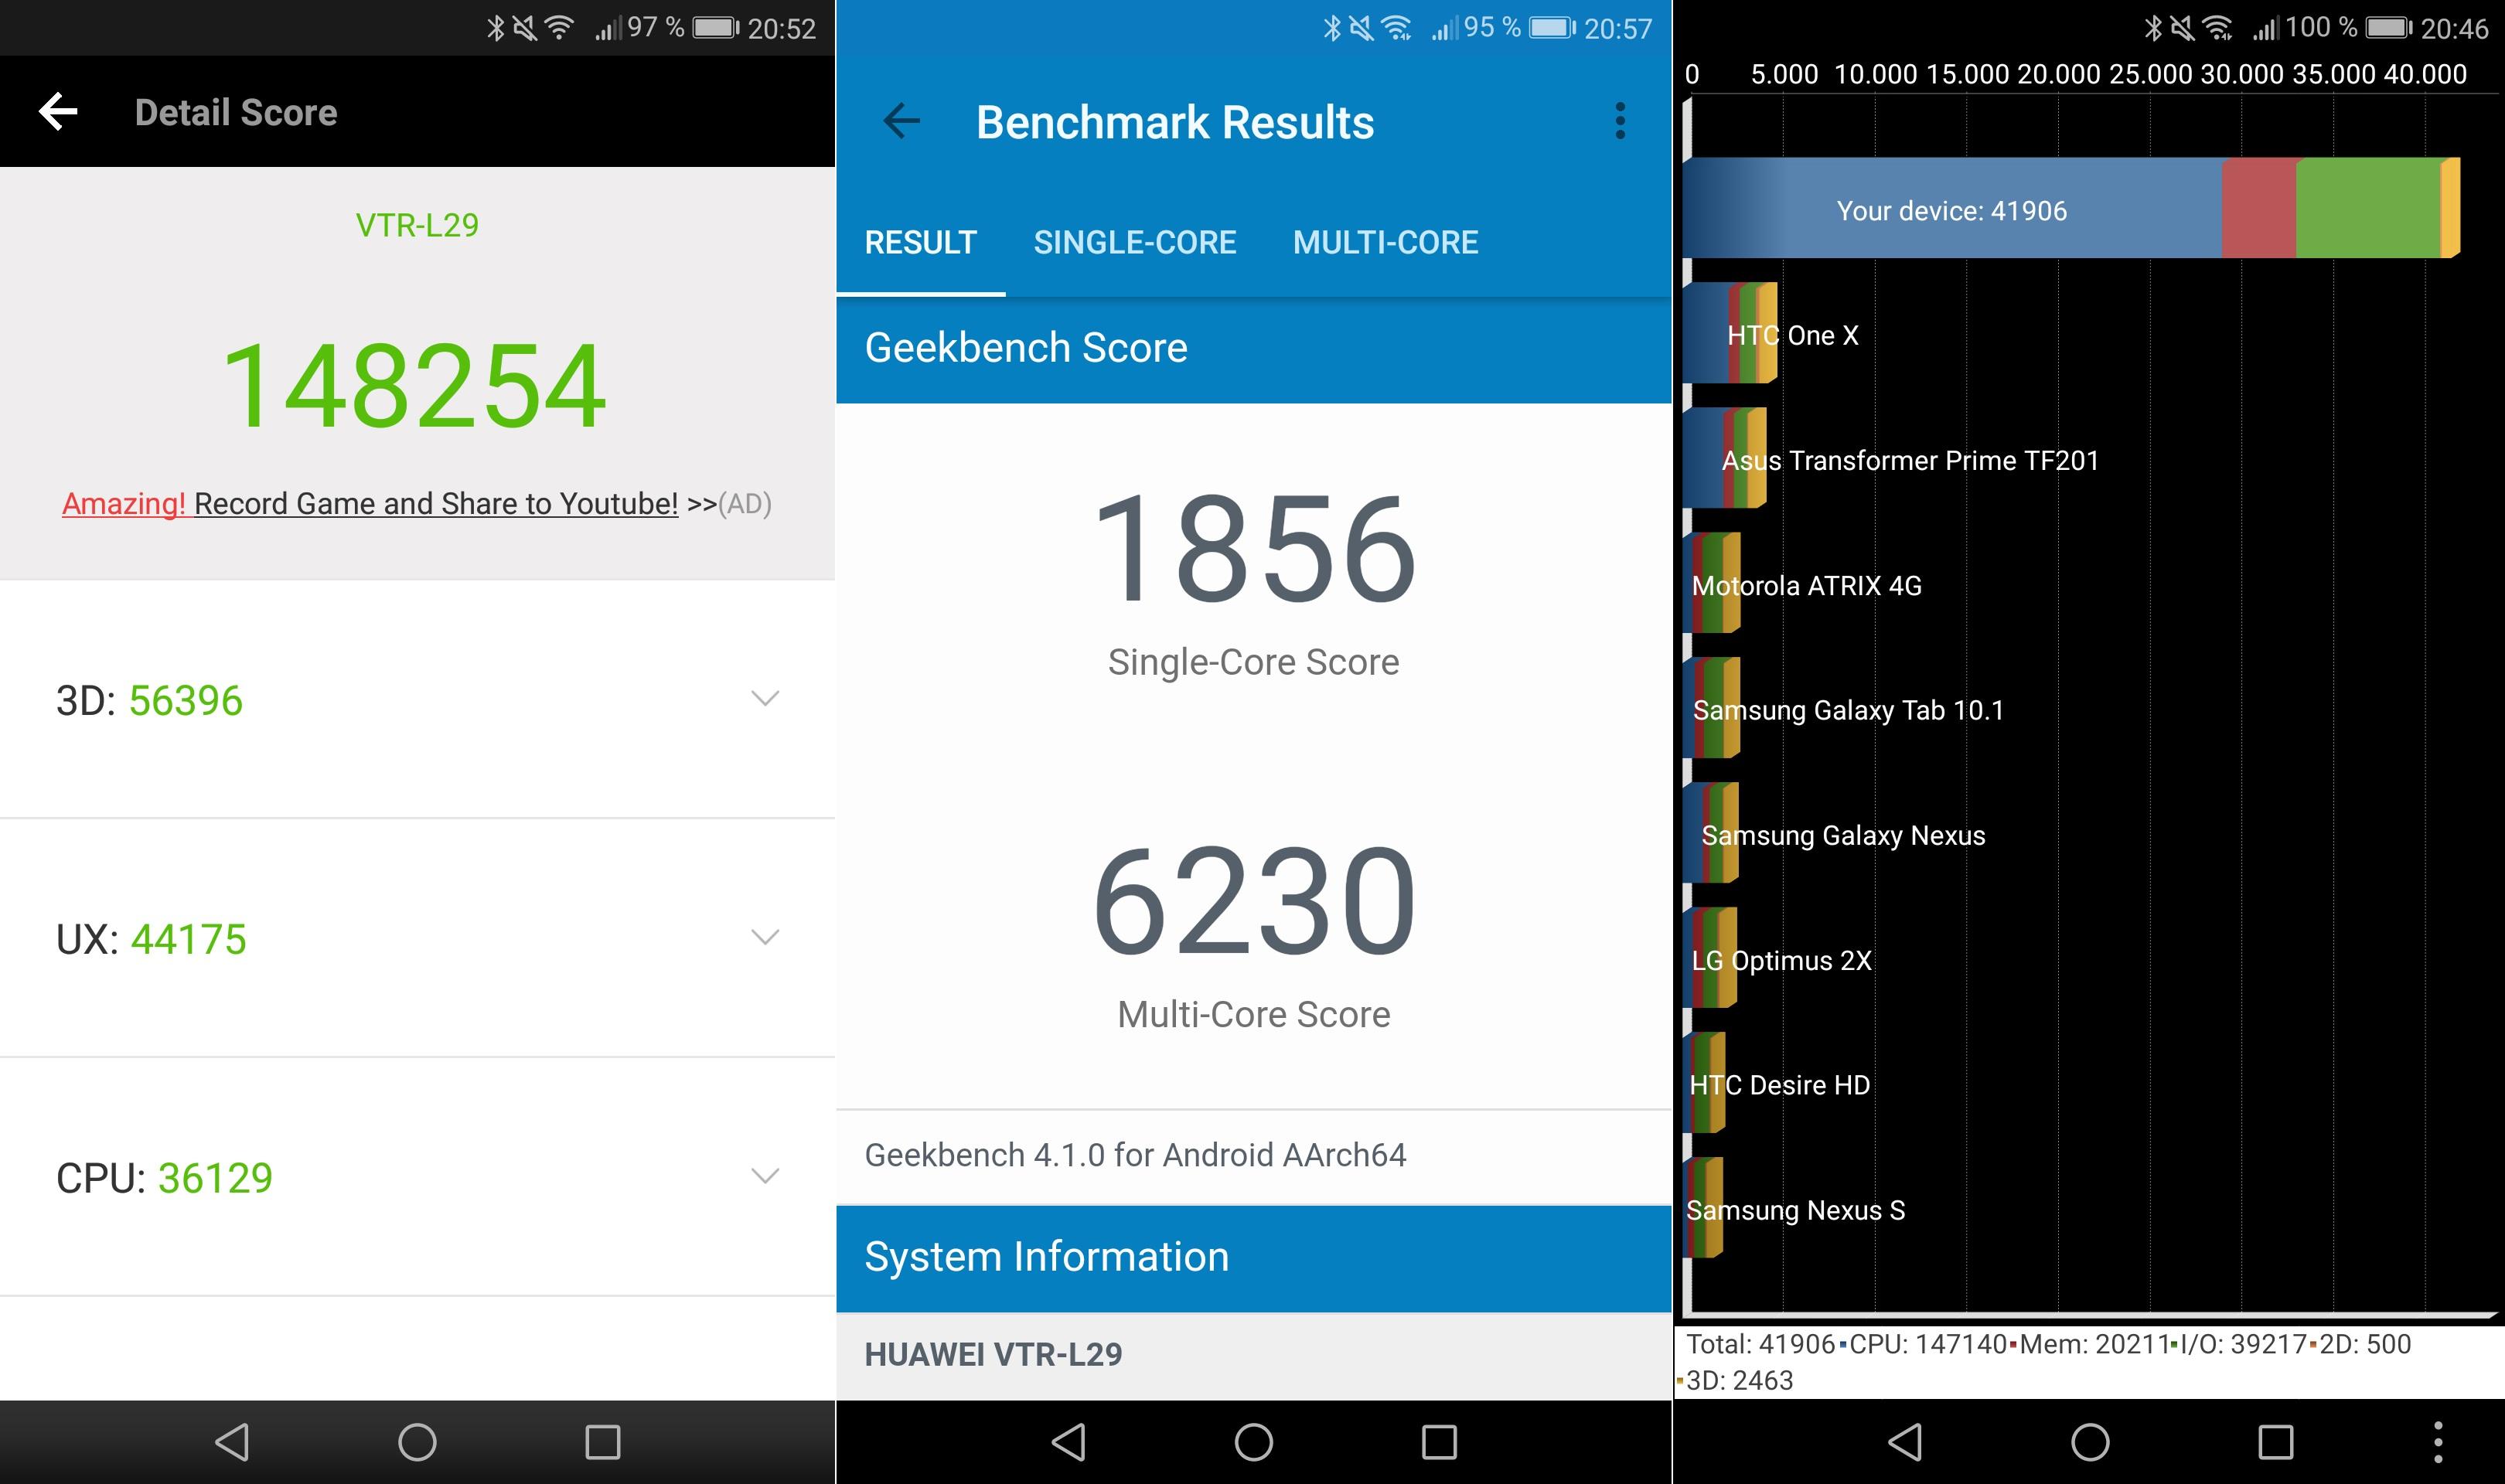 Snapdragon 660 vs Kirin 960 (Huawei P10 Kirin)